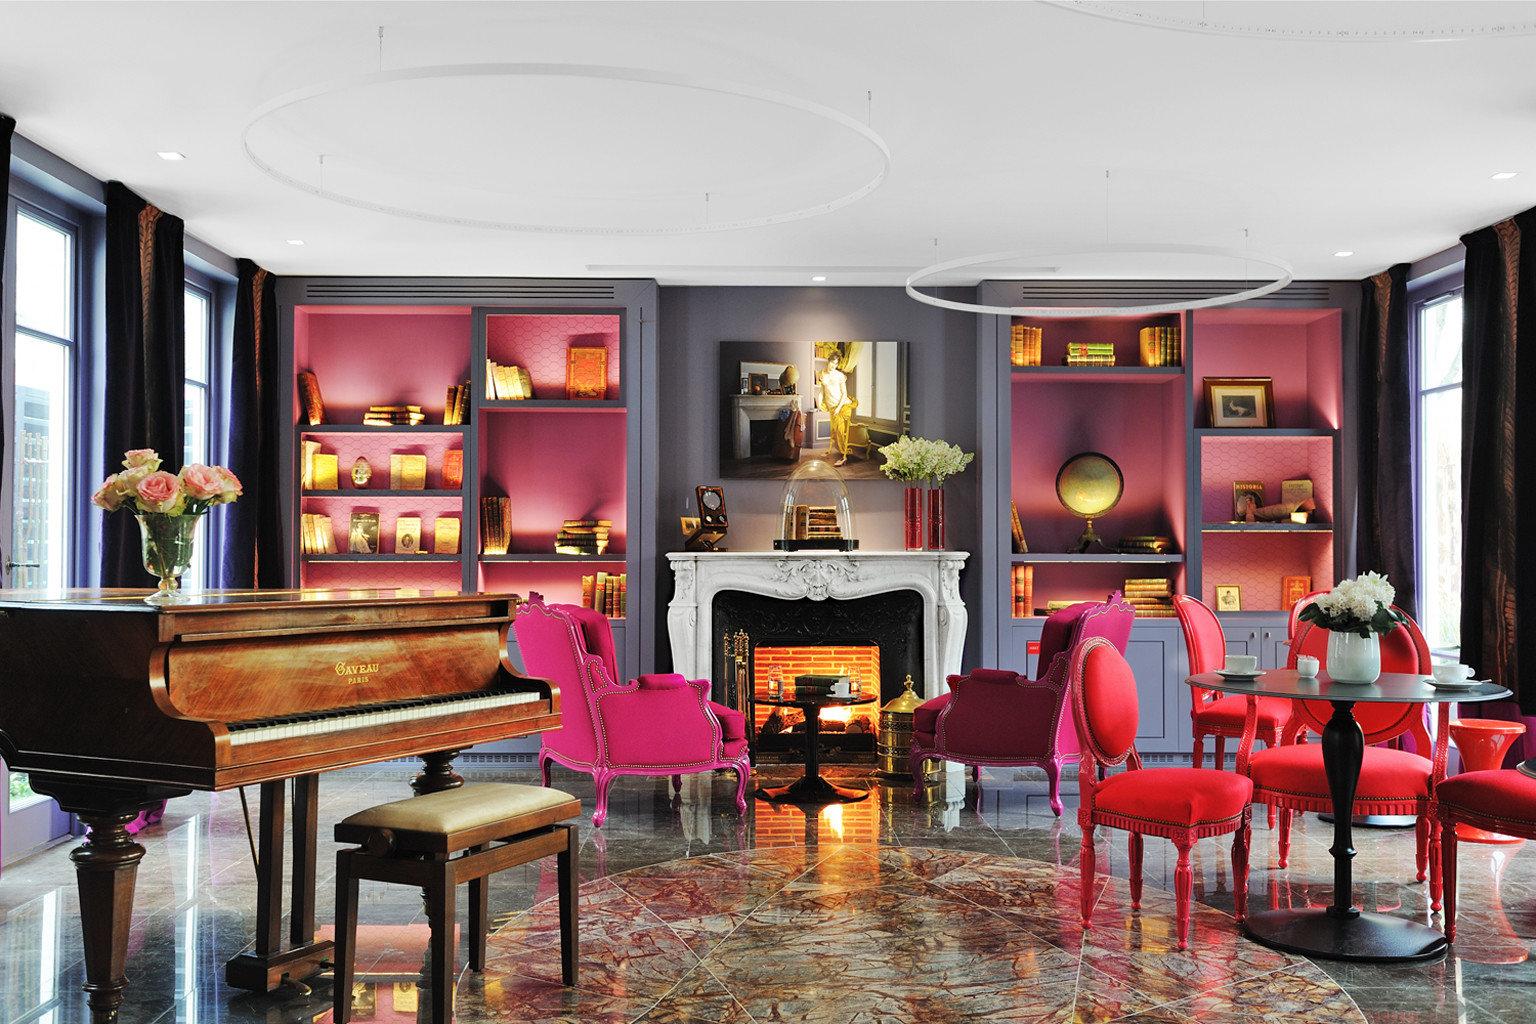 Fireplace Hip Lounge Luxury Modern recreation room restaurant Bar living room